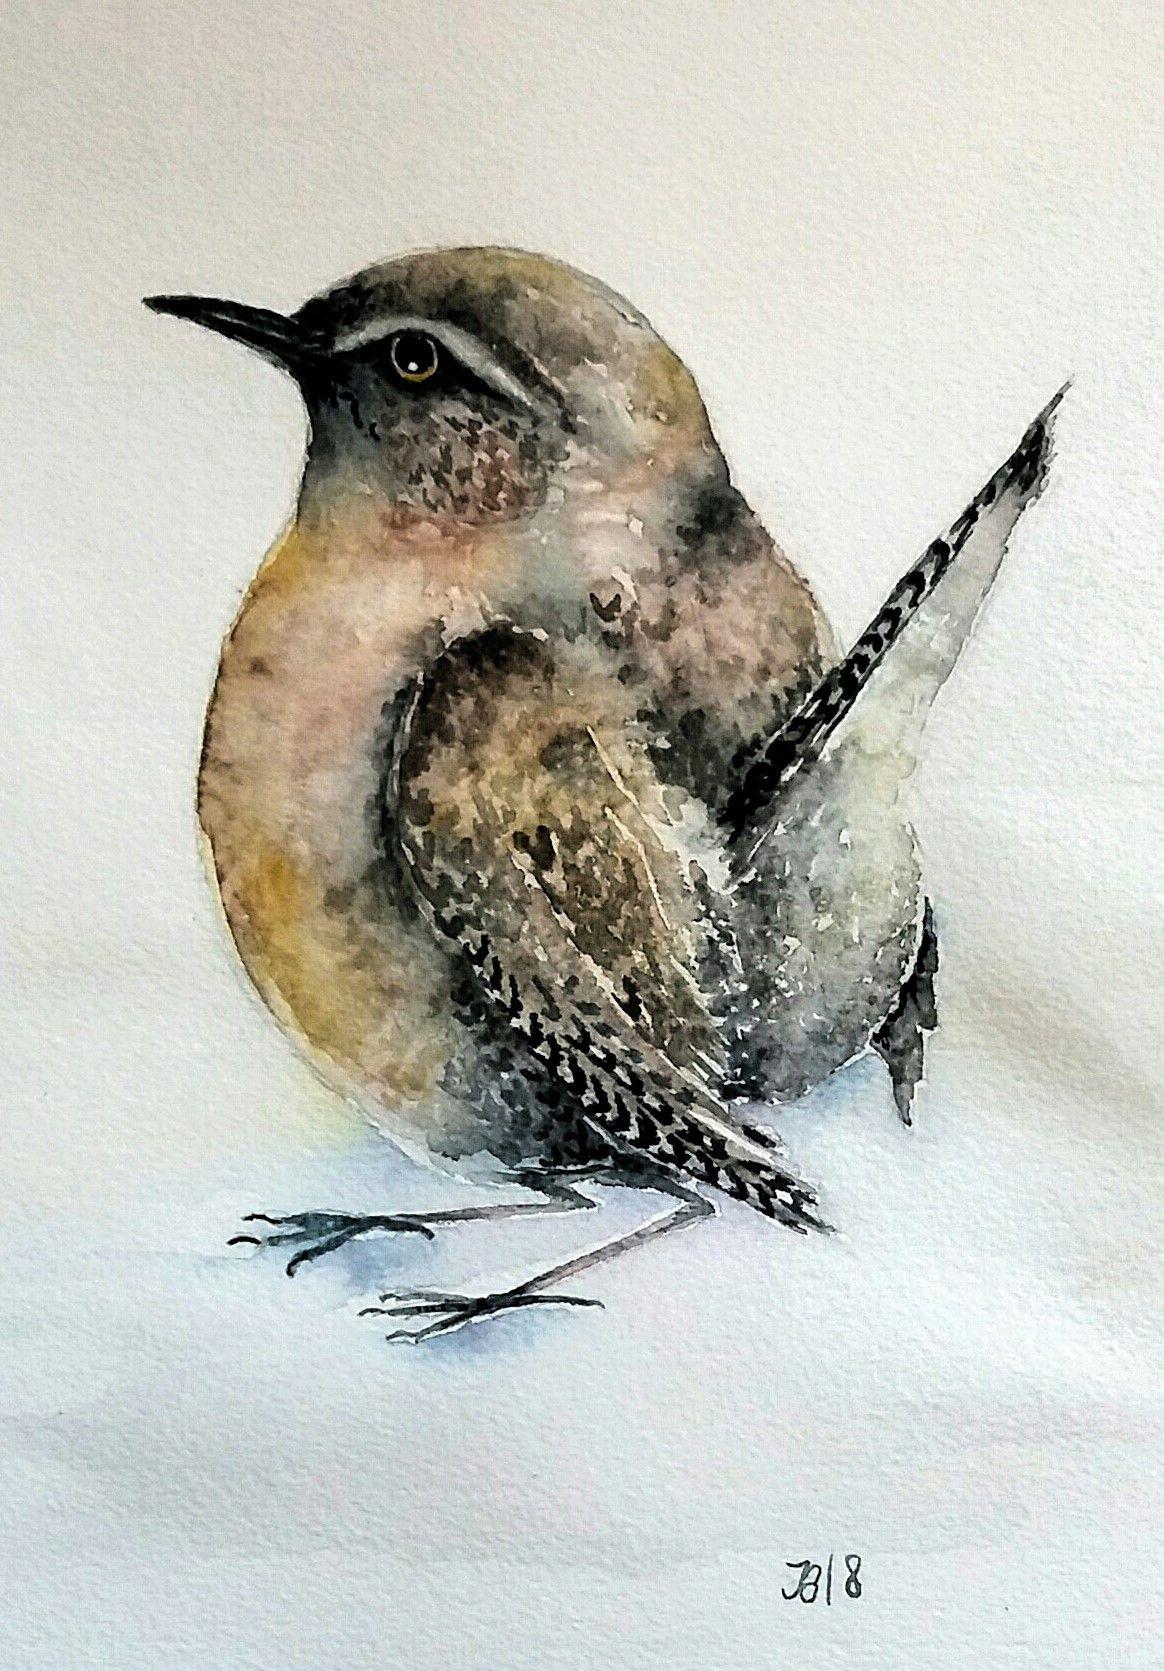 Aquarell Zaunkonig Watercolor Wren Aquarell Wasserfarben Vogel